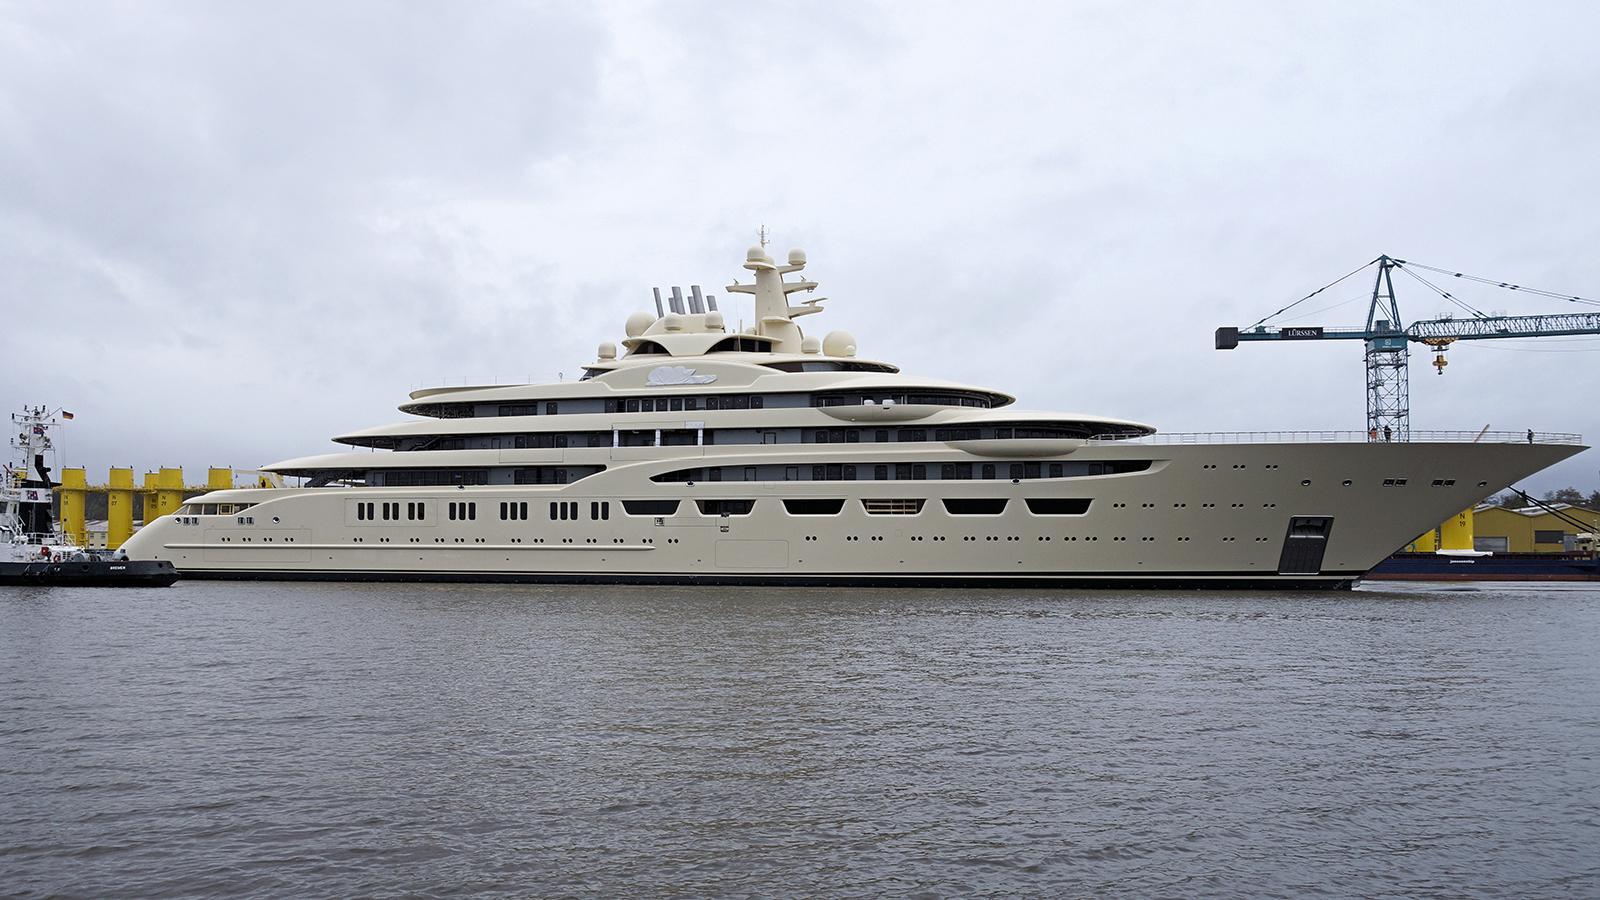 dilbar-motor-yacht-lurssen-2016-156m-shipyard-profile